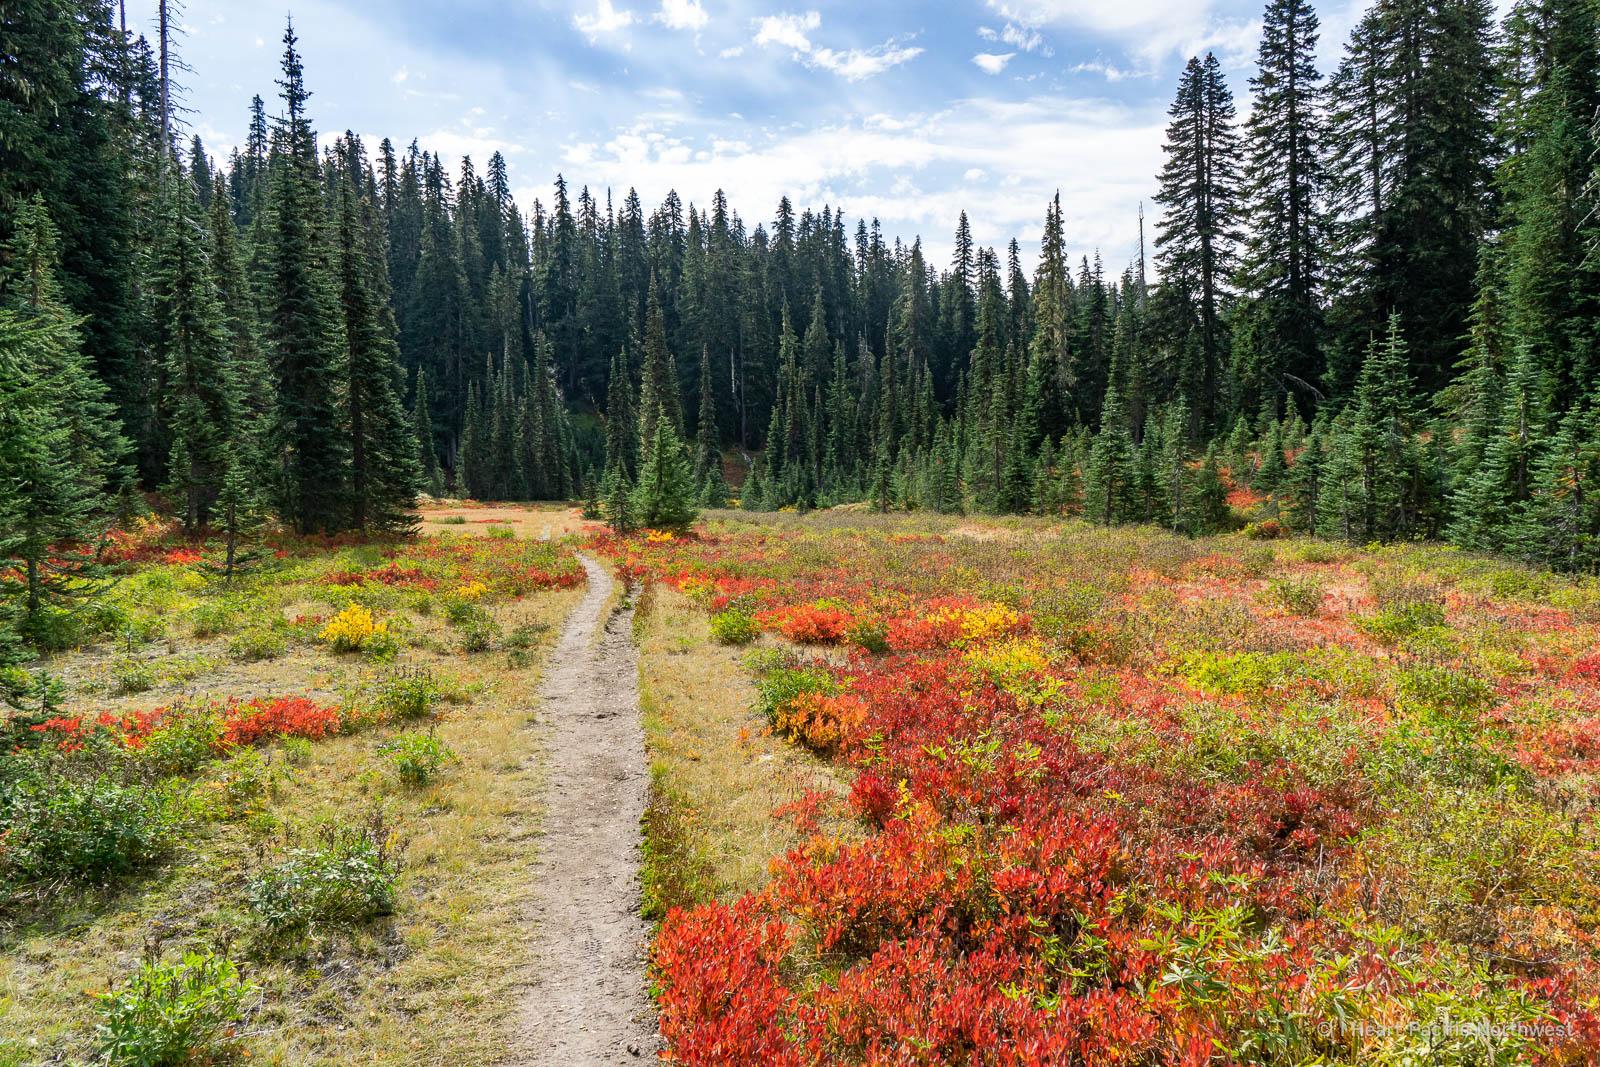 Indian Heaven Wilderness - Deep Lake backpacking trip